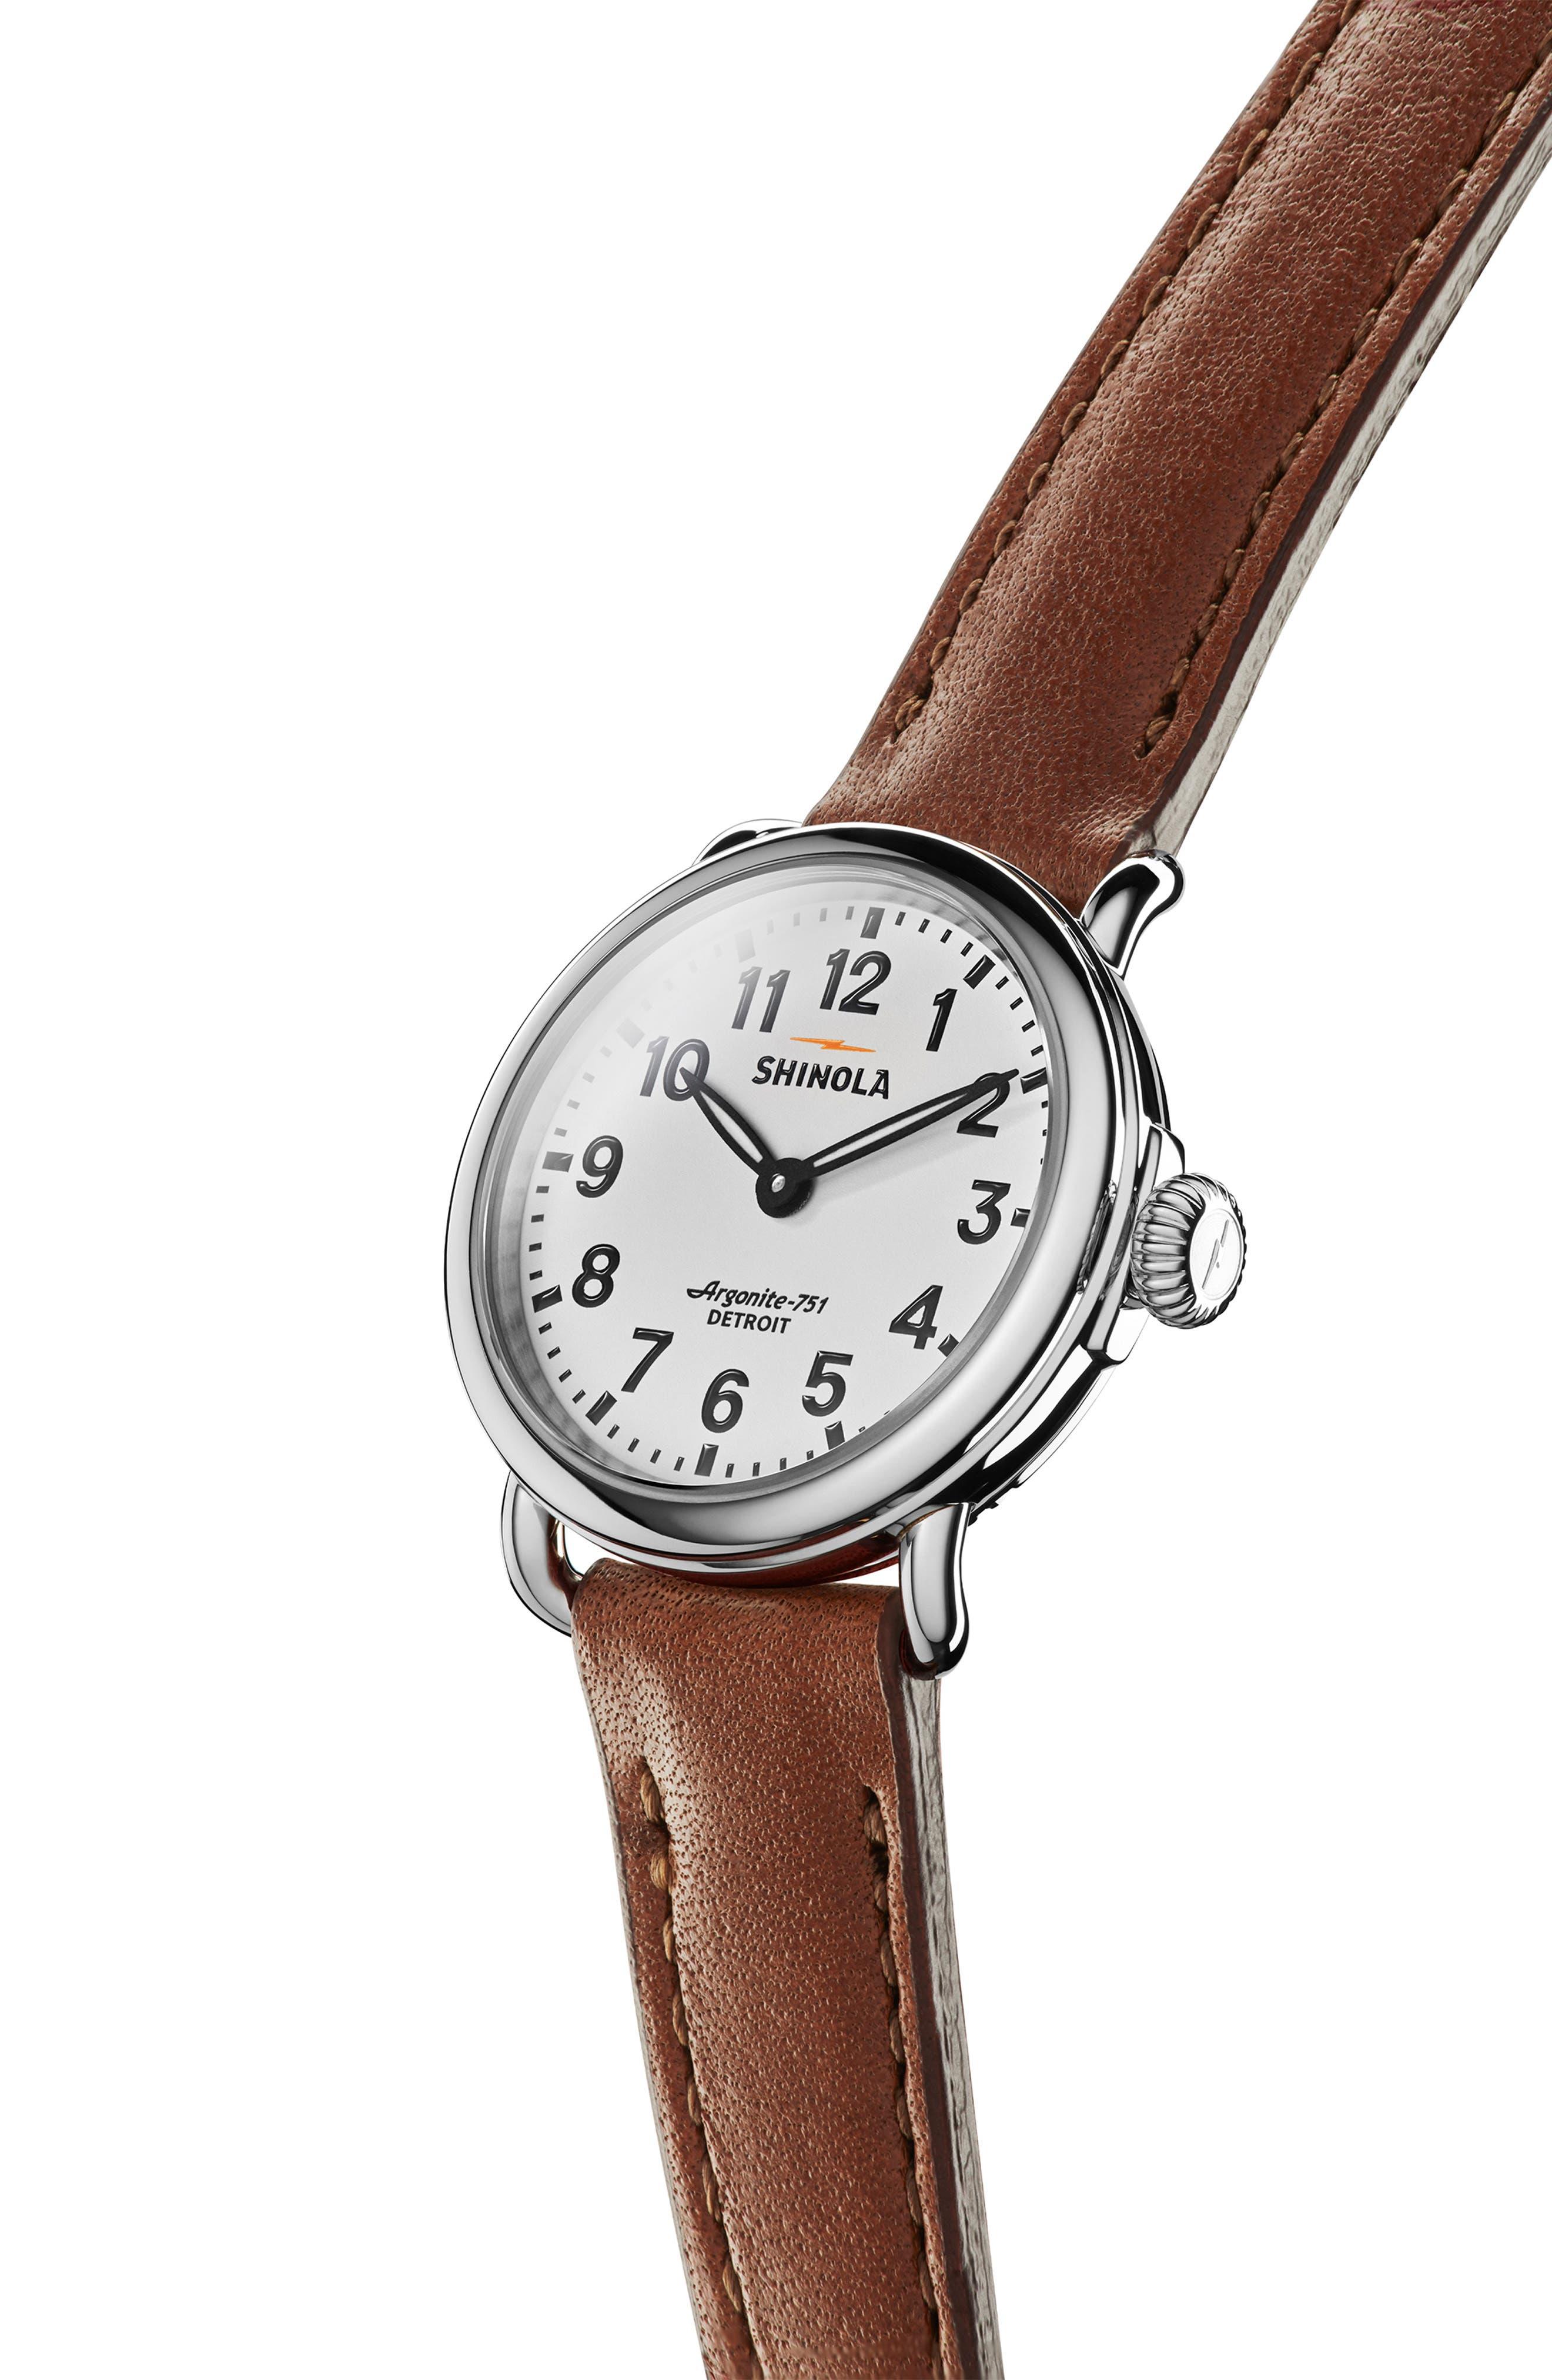 SHINOLA, The Runwell Leather Strap Watch, 28mm, Alternate thumbnail 5, color, DARK COGNAC/ WHITE/ SILVER